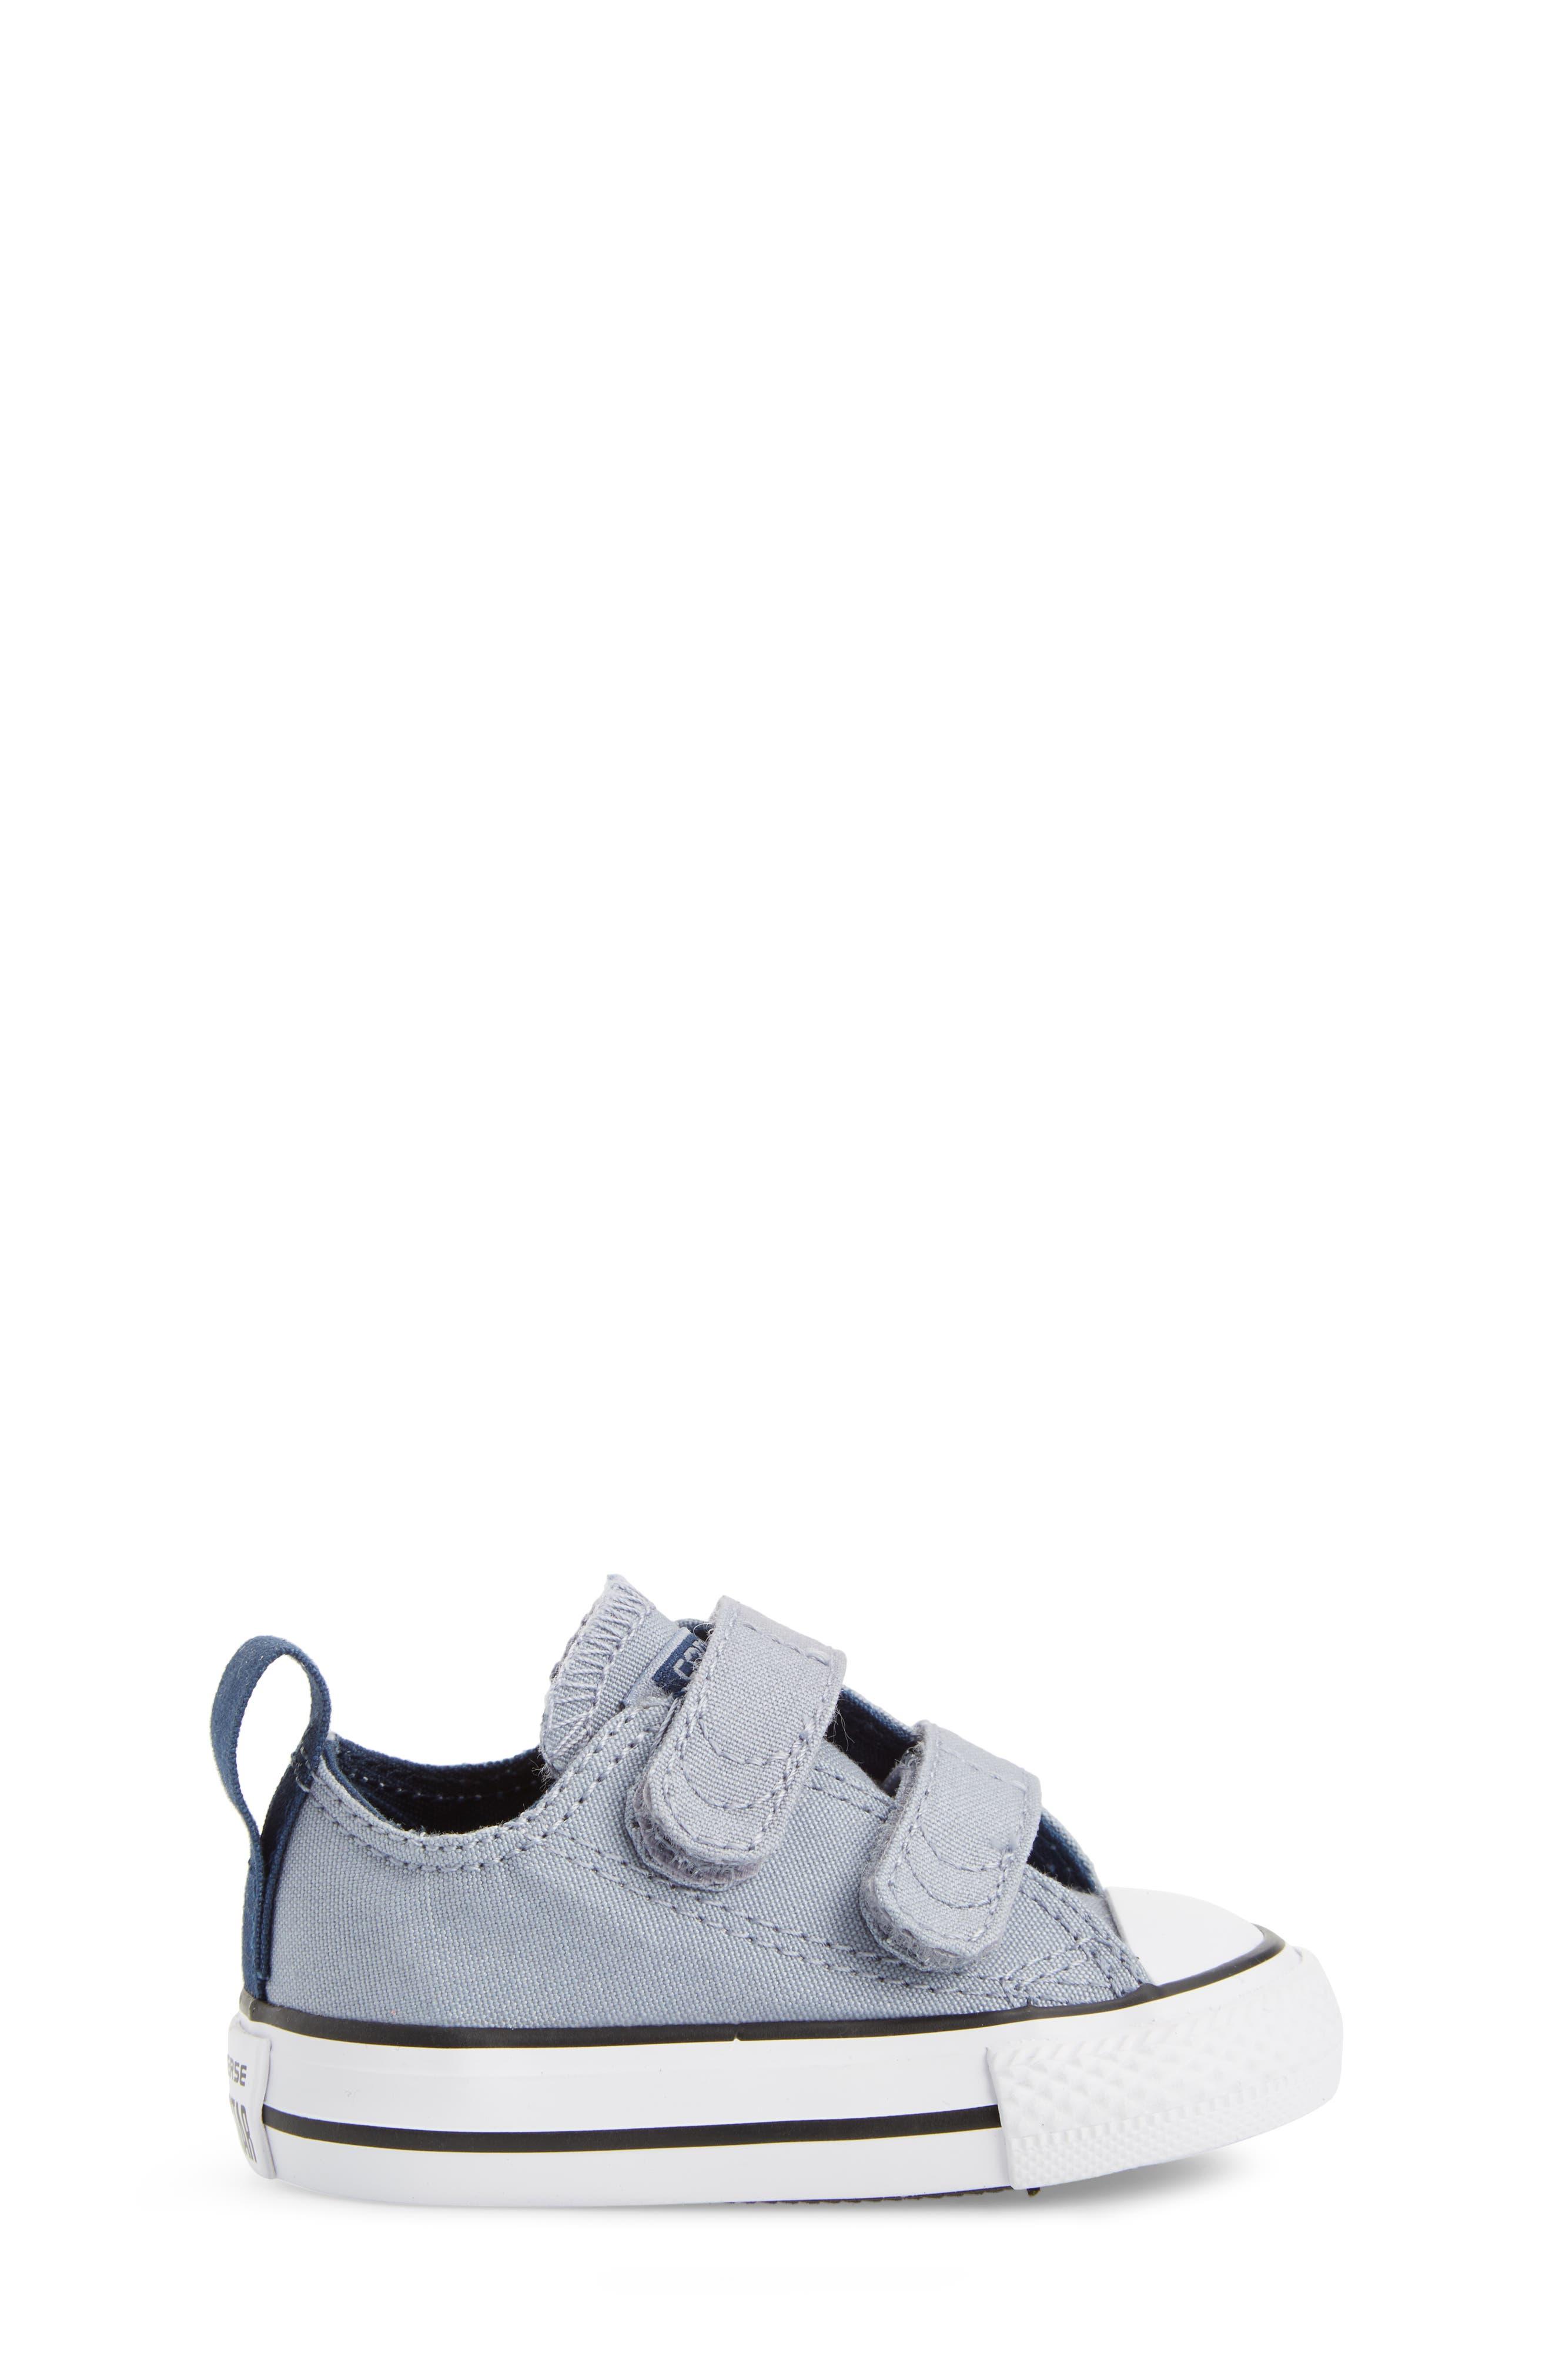 Chuck Taylor<sup>®</sup> All Star<sup>®</sup> Sneaker,                             Alternate thumbnail 3, color,                             Glacier Grey